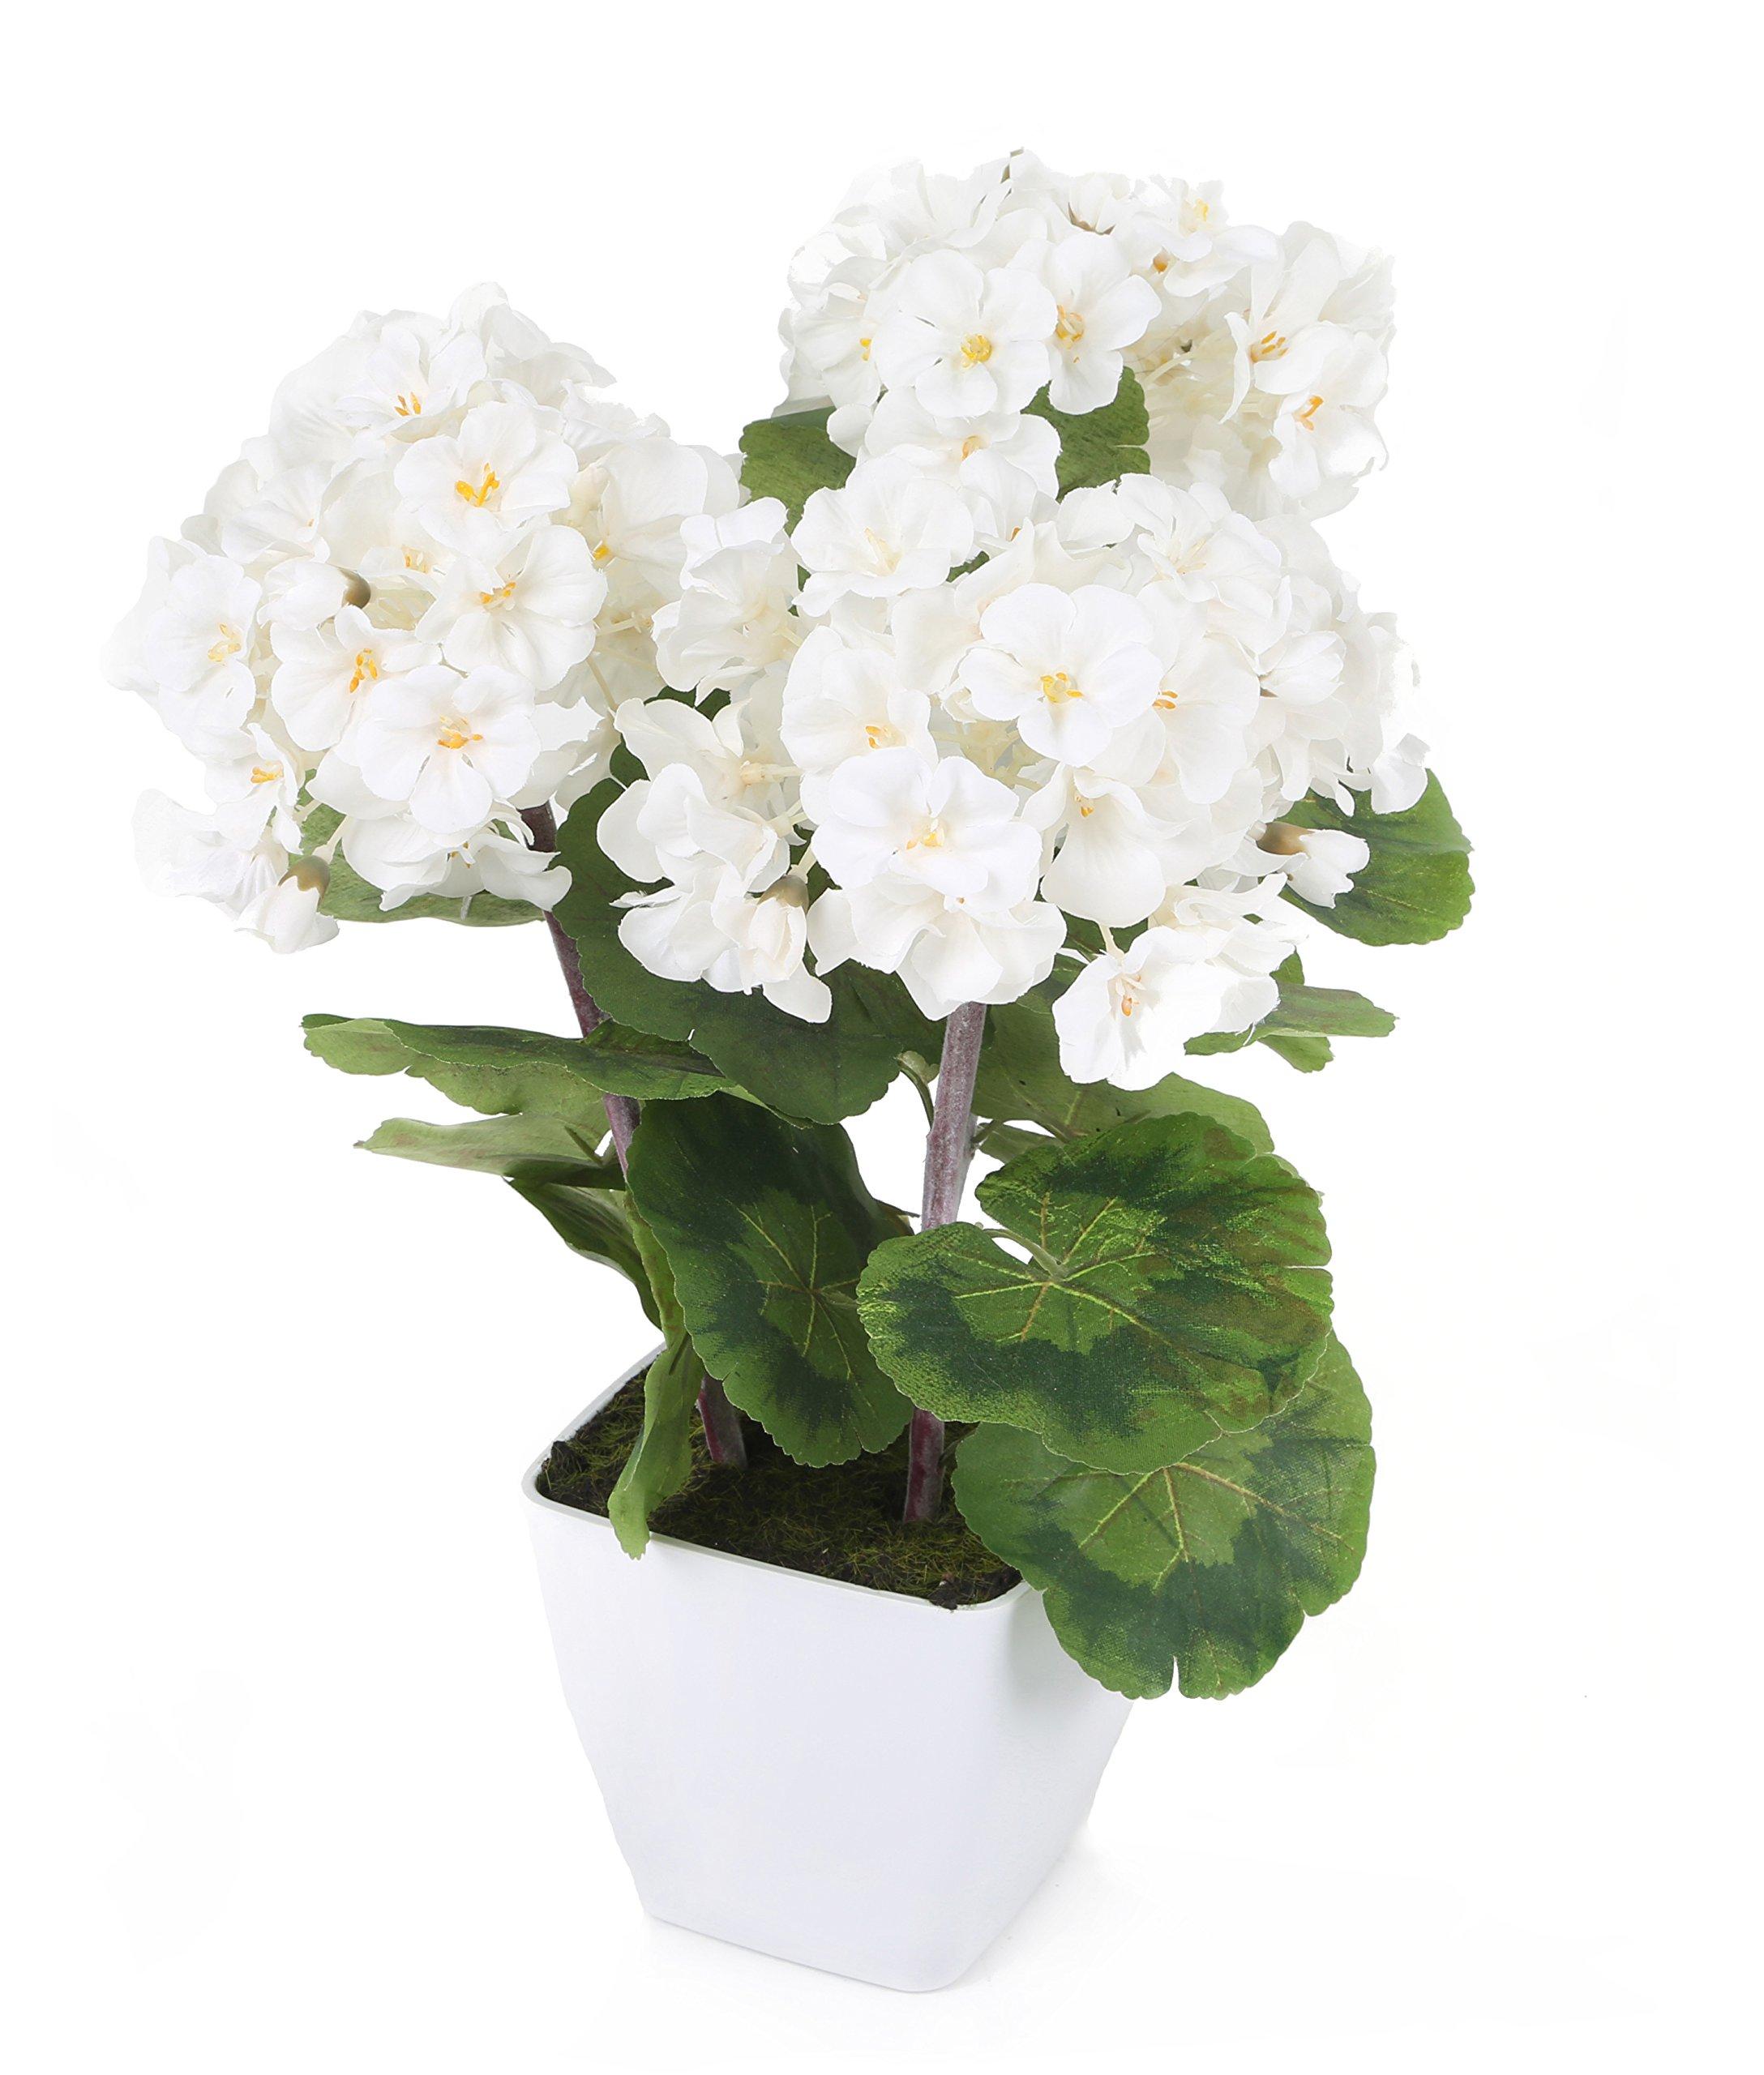 Closer To Nature FP023WS – Planta de Geranio Zonal, 37 cm, color blanco